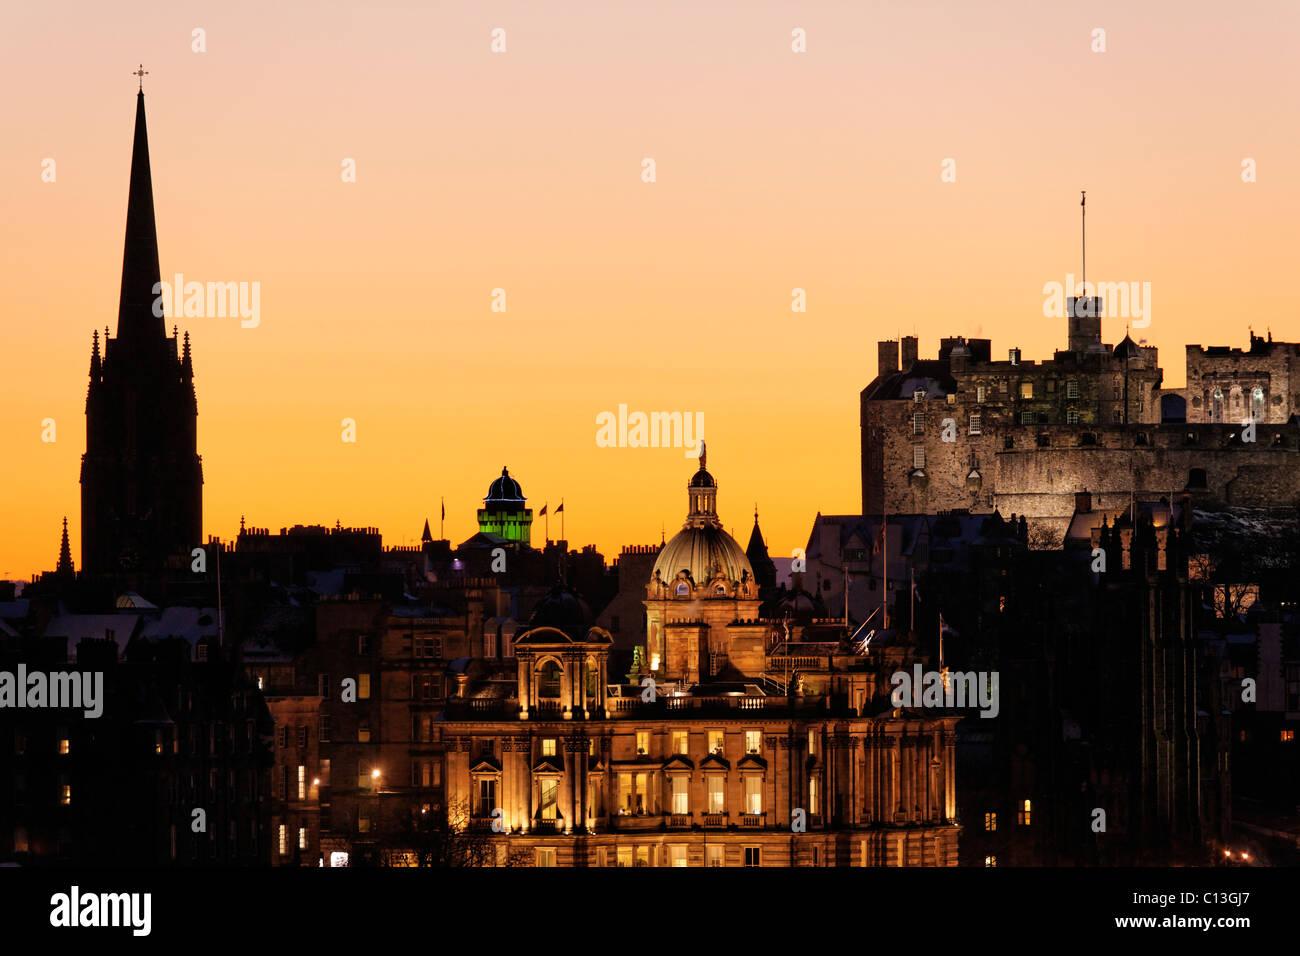 Edinburgh Castle and the Bank of Scotland HQ, Edinburgh, Scotland, UK. -